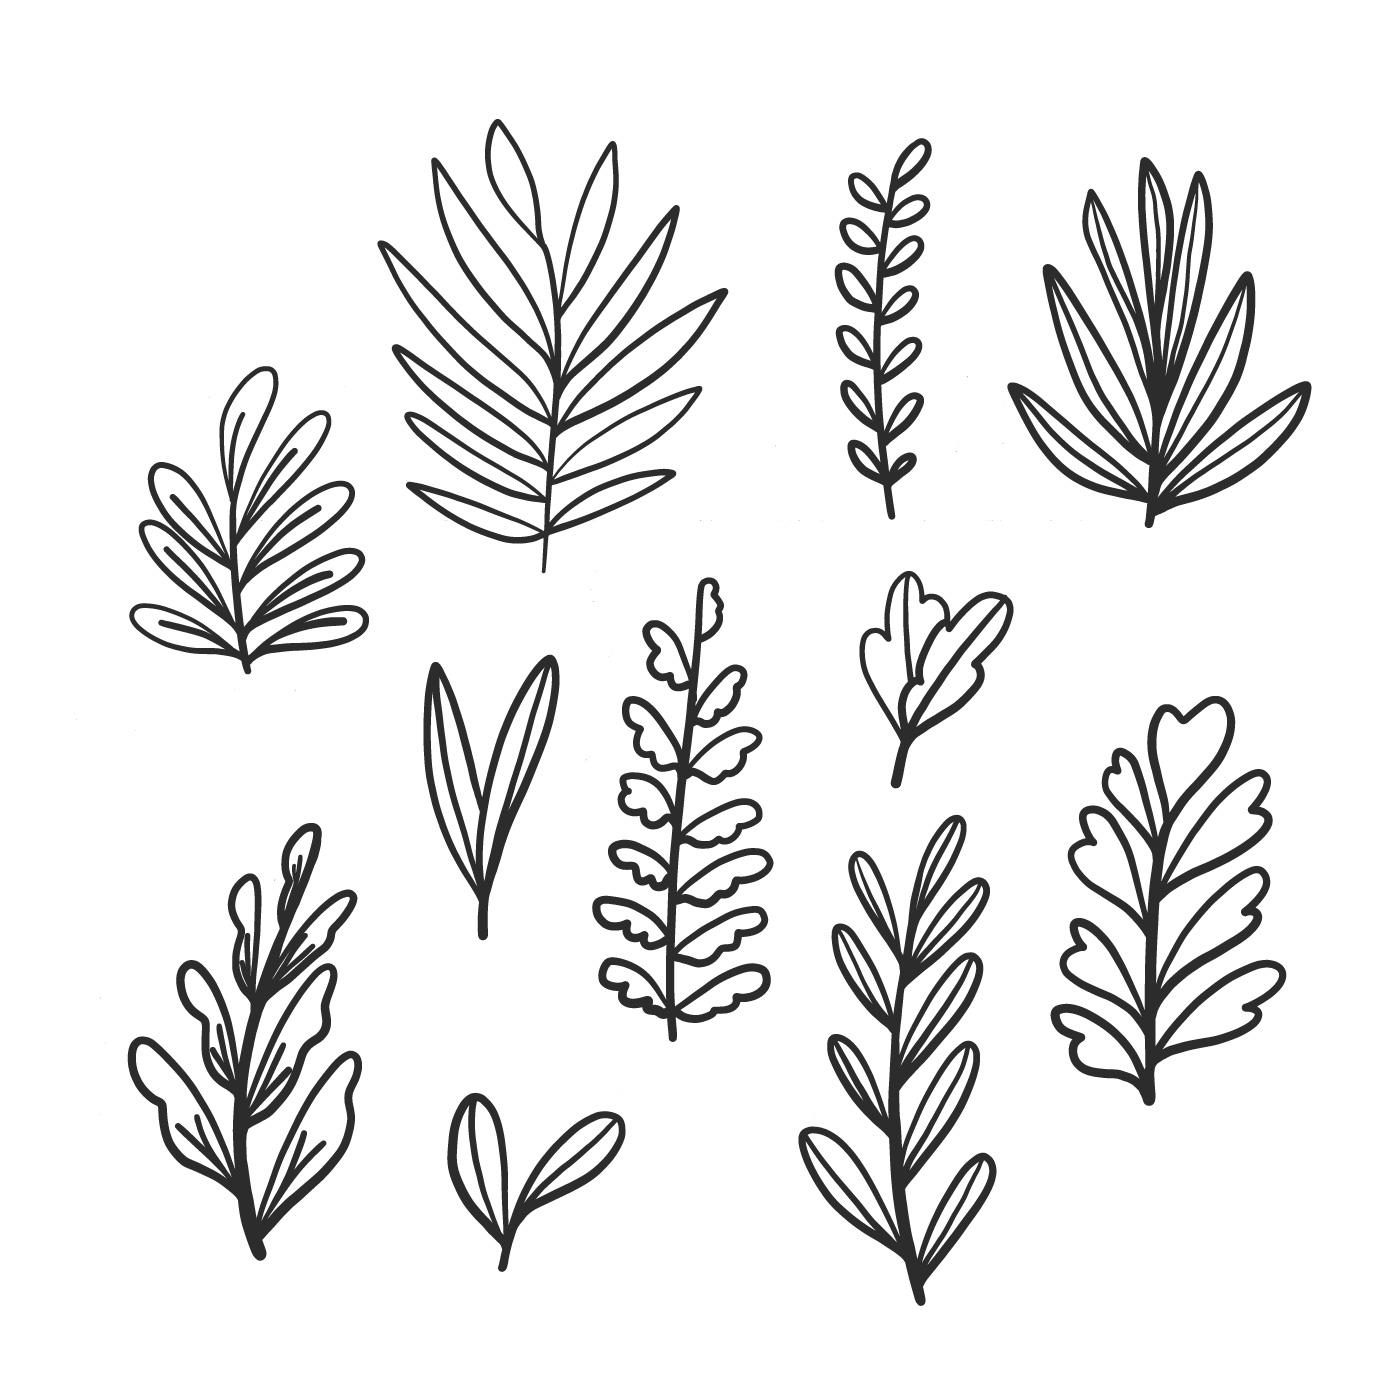 Doodle Leaves Collection Set Download Free Vectors Clipart Graphics Vector Art